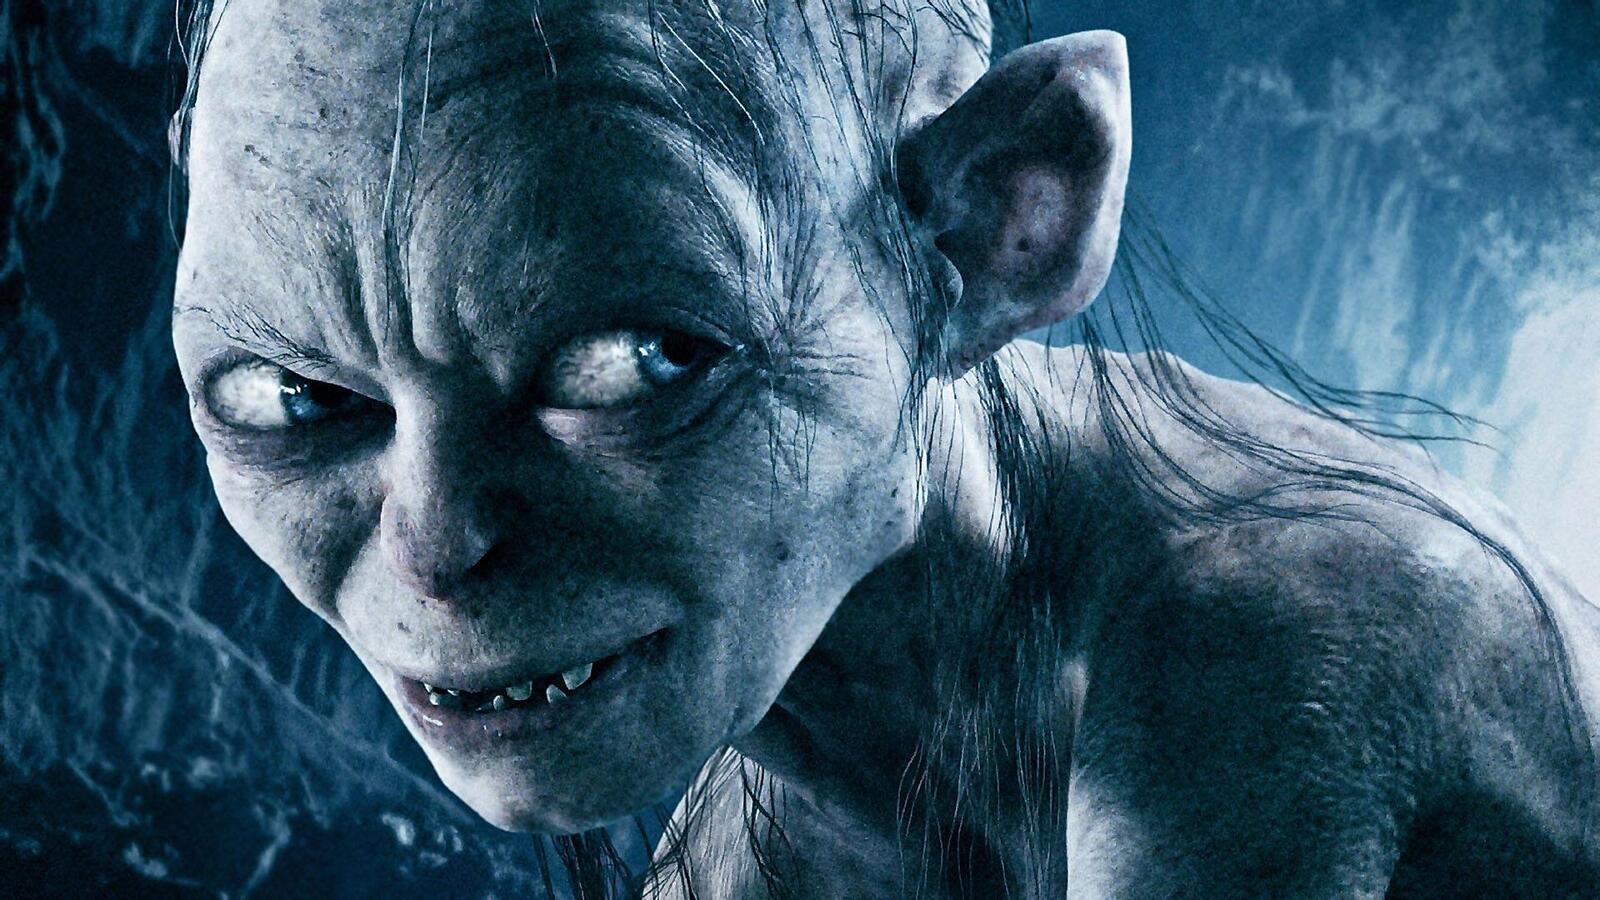 gollum-the-hobbit.jpg